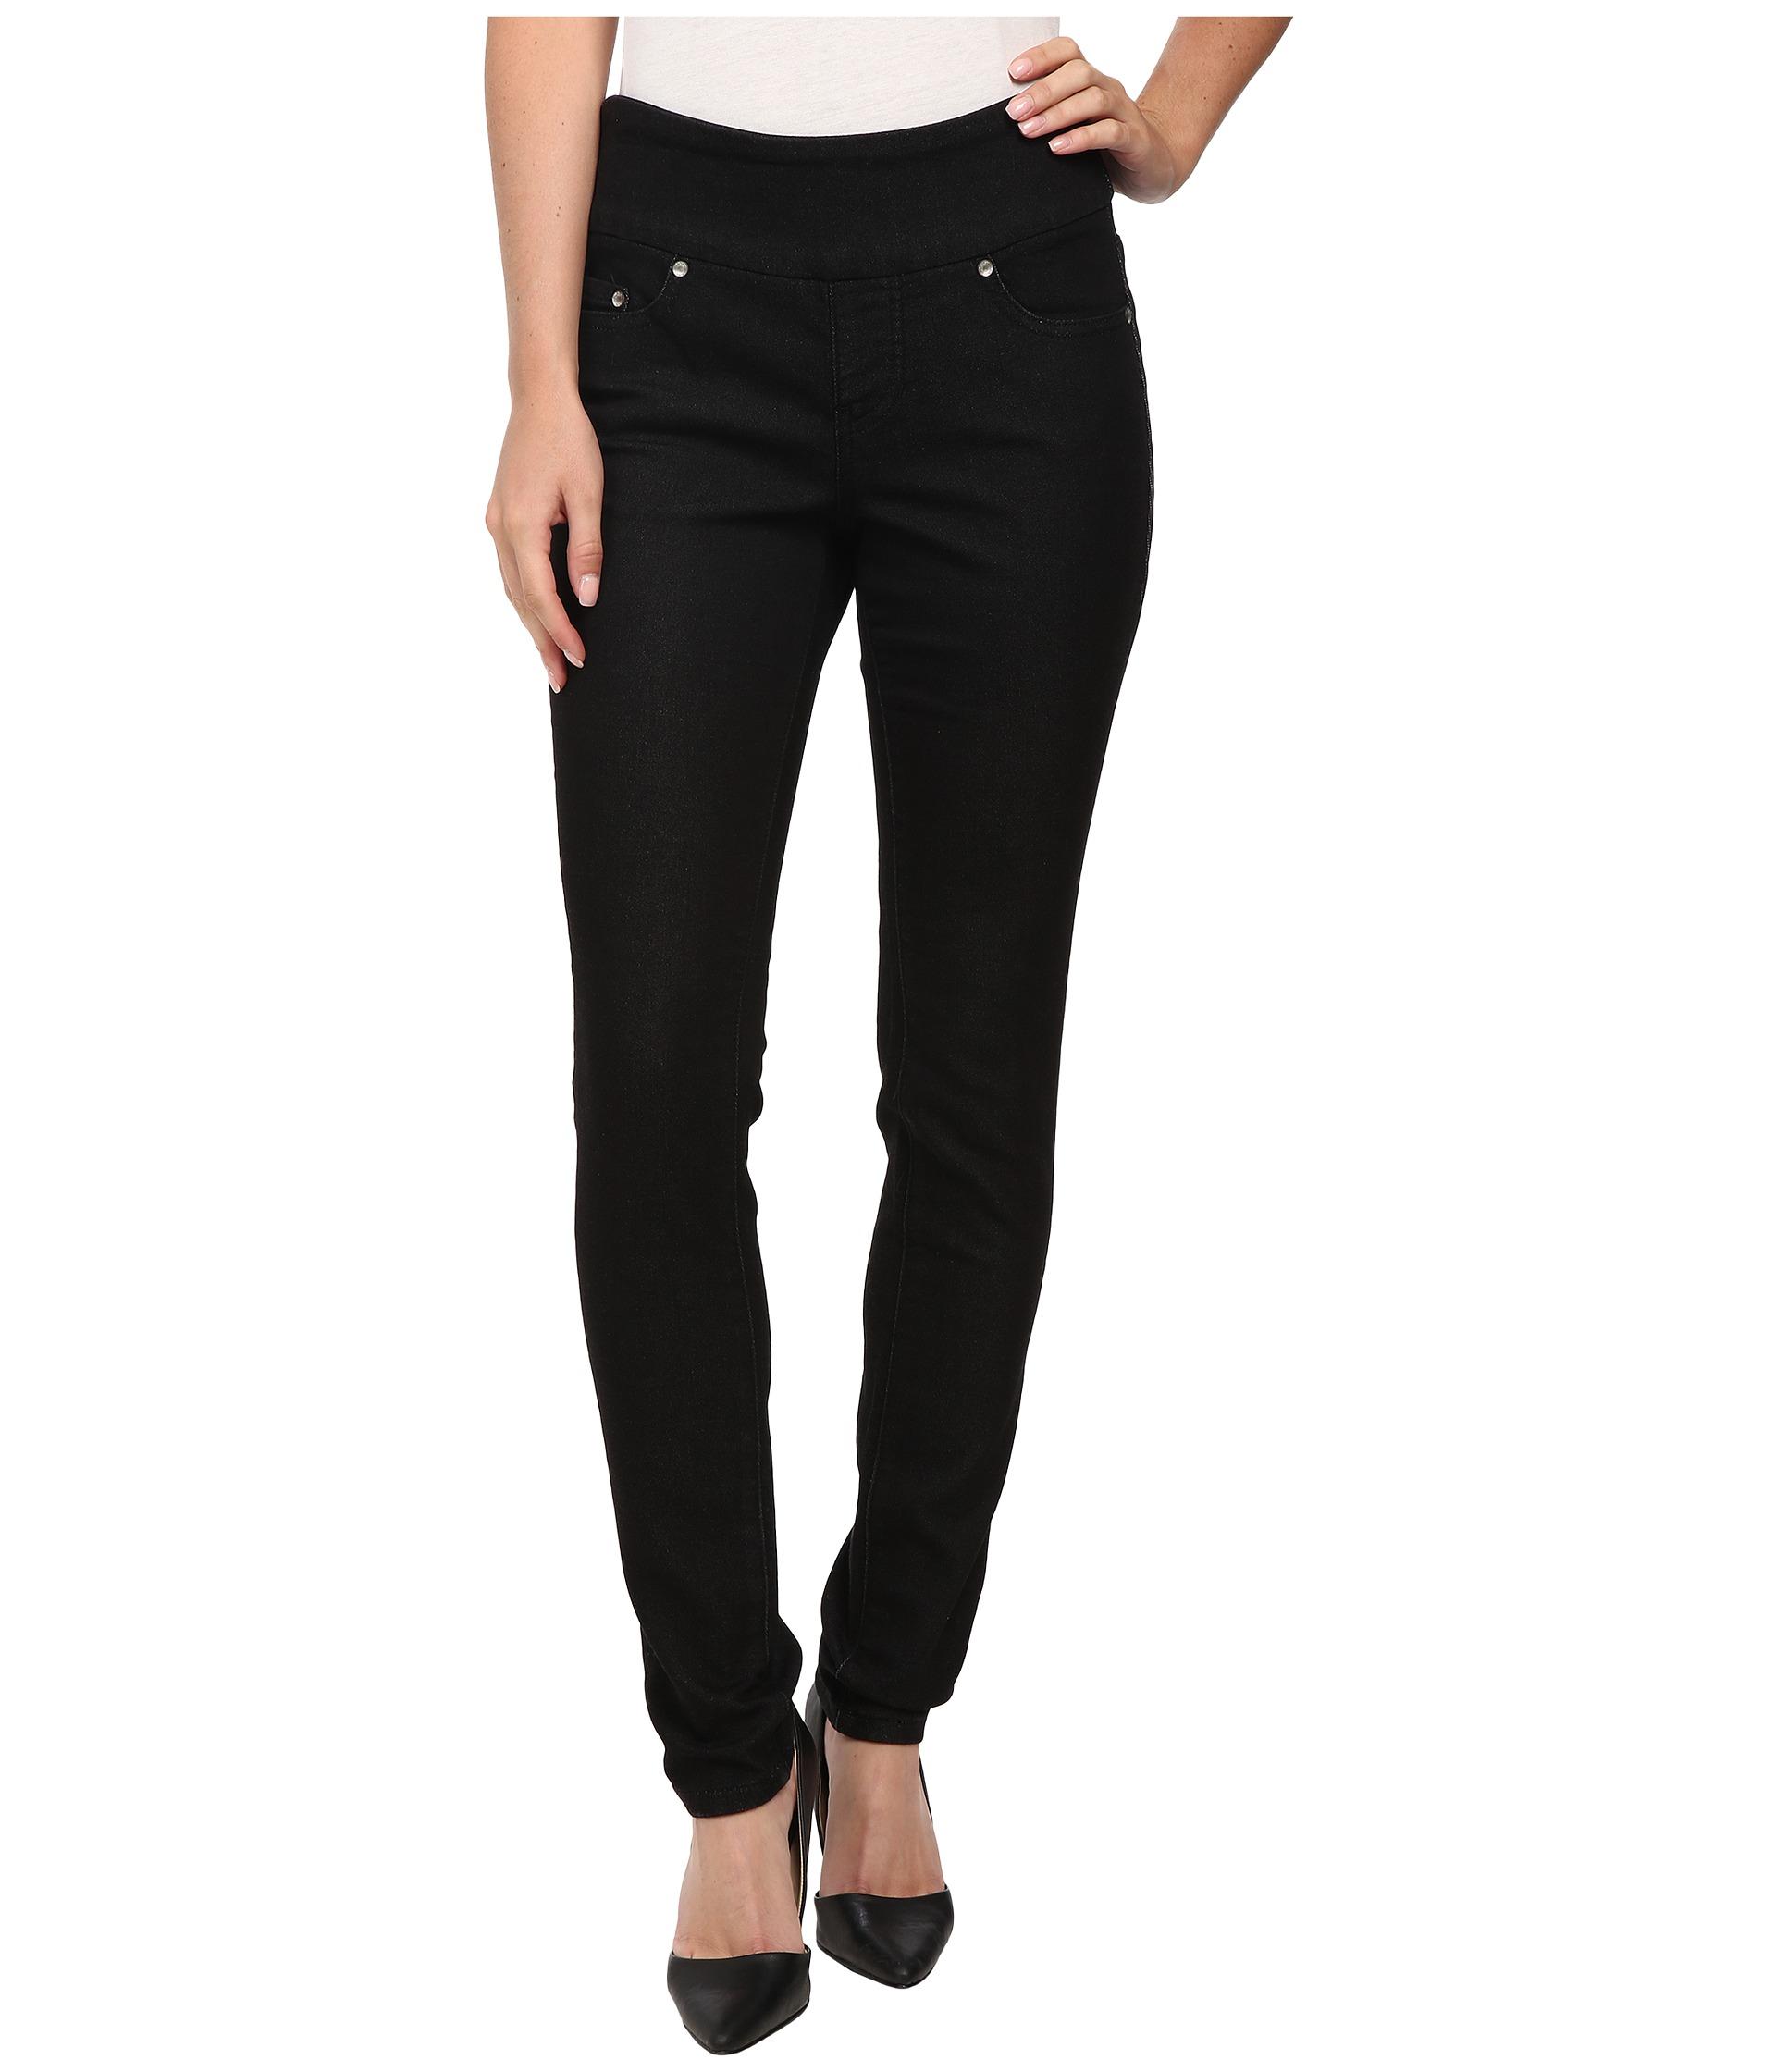 Jag Jeans Nora Pull-On Skinny Knit Denim in Black Rinse at Zappos.com